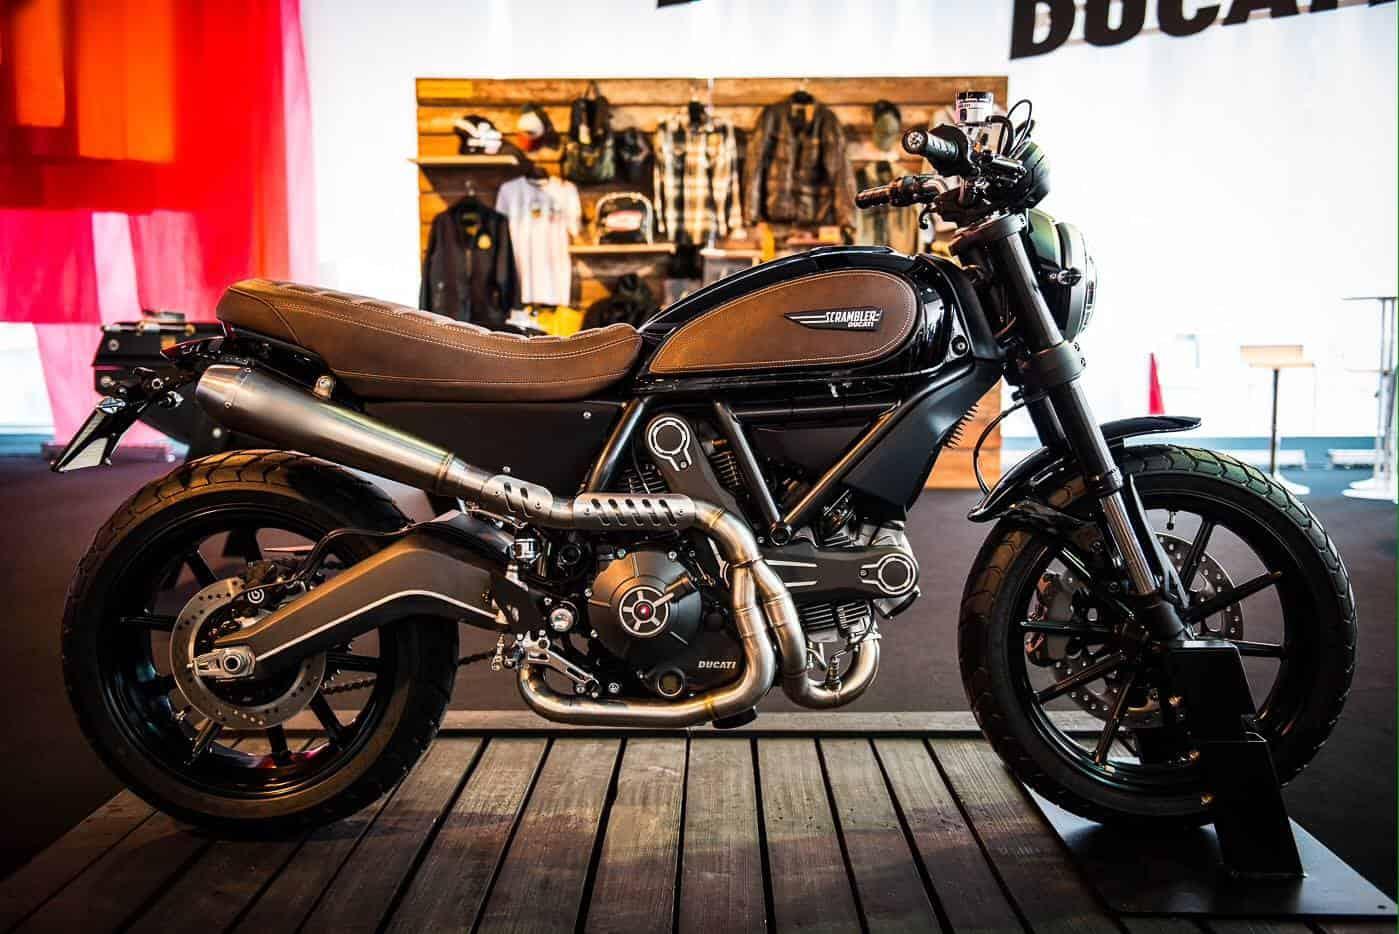 Ducati Scrambler Video Reviews - Timeless 2 Wheels